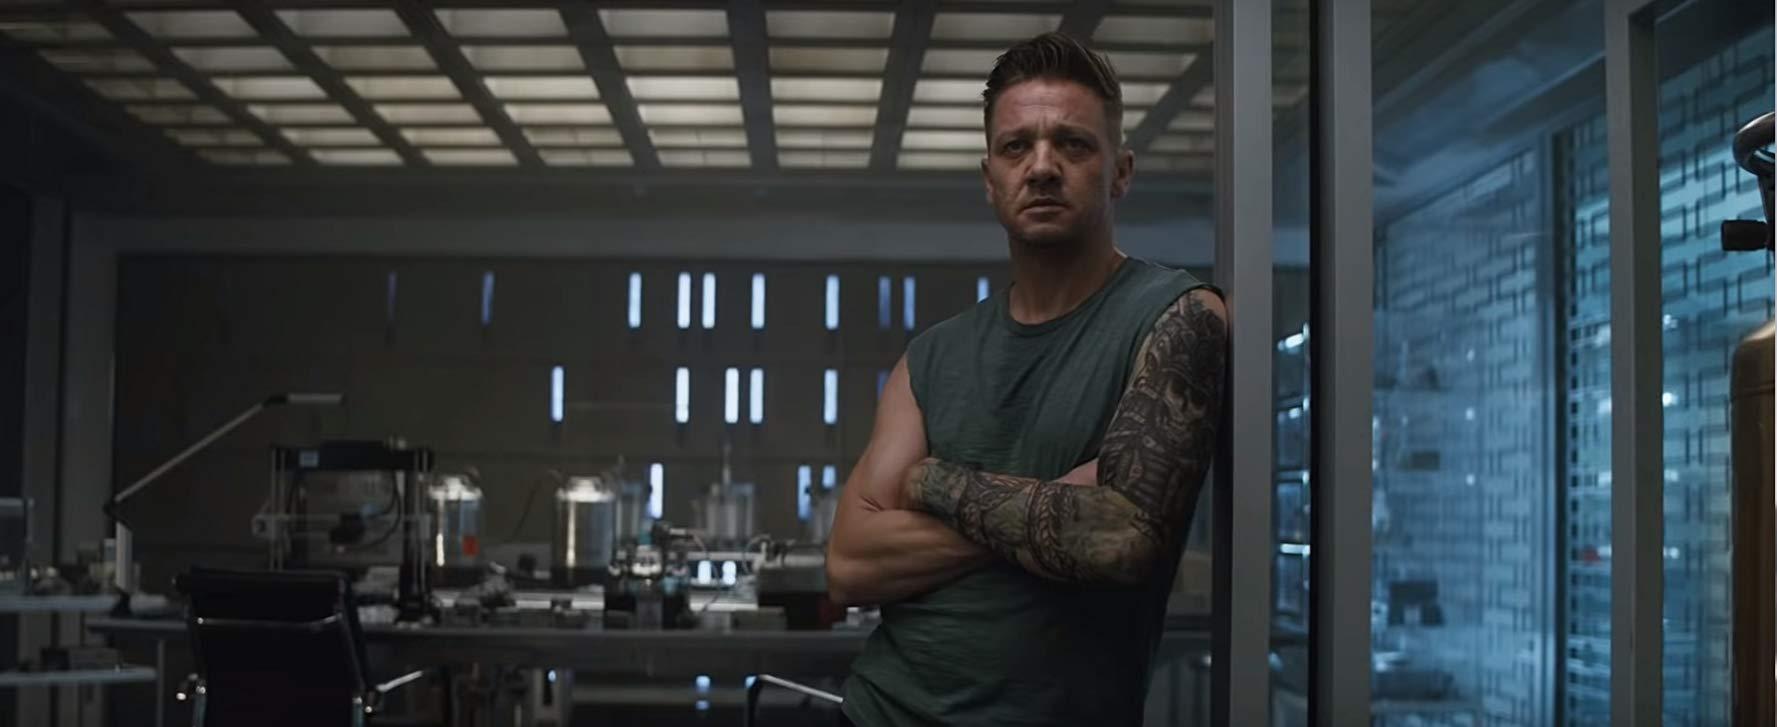 Avengers: Endgame, Jeremy Renner in un scena del film